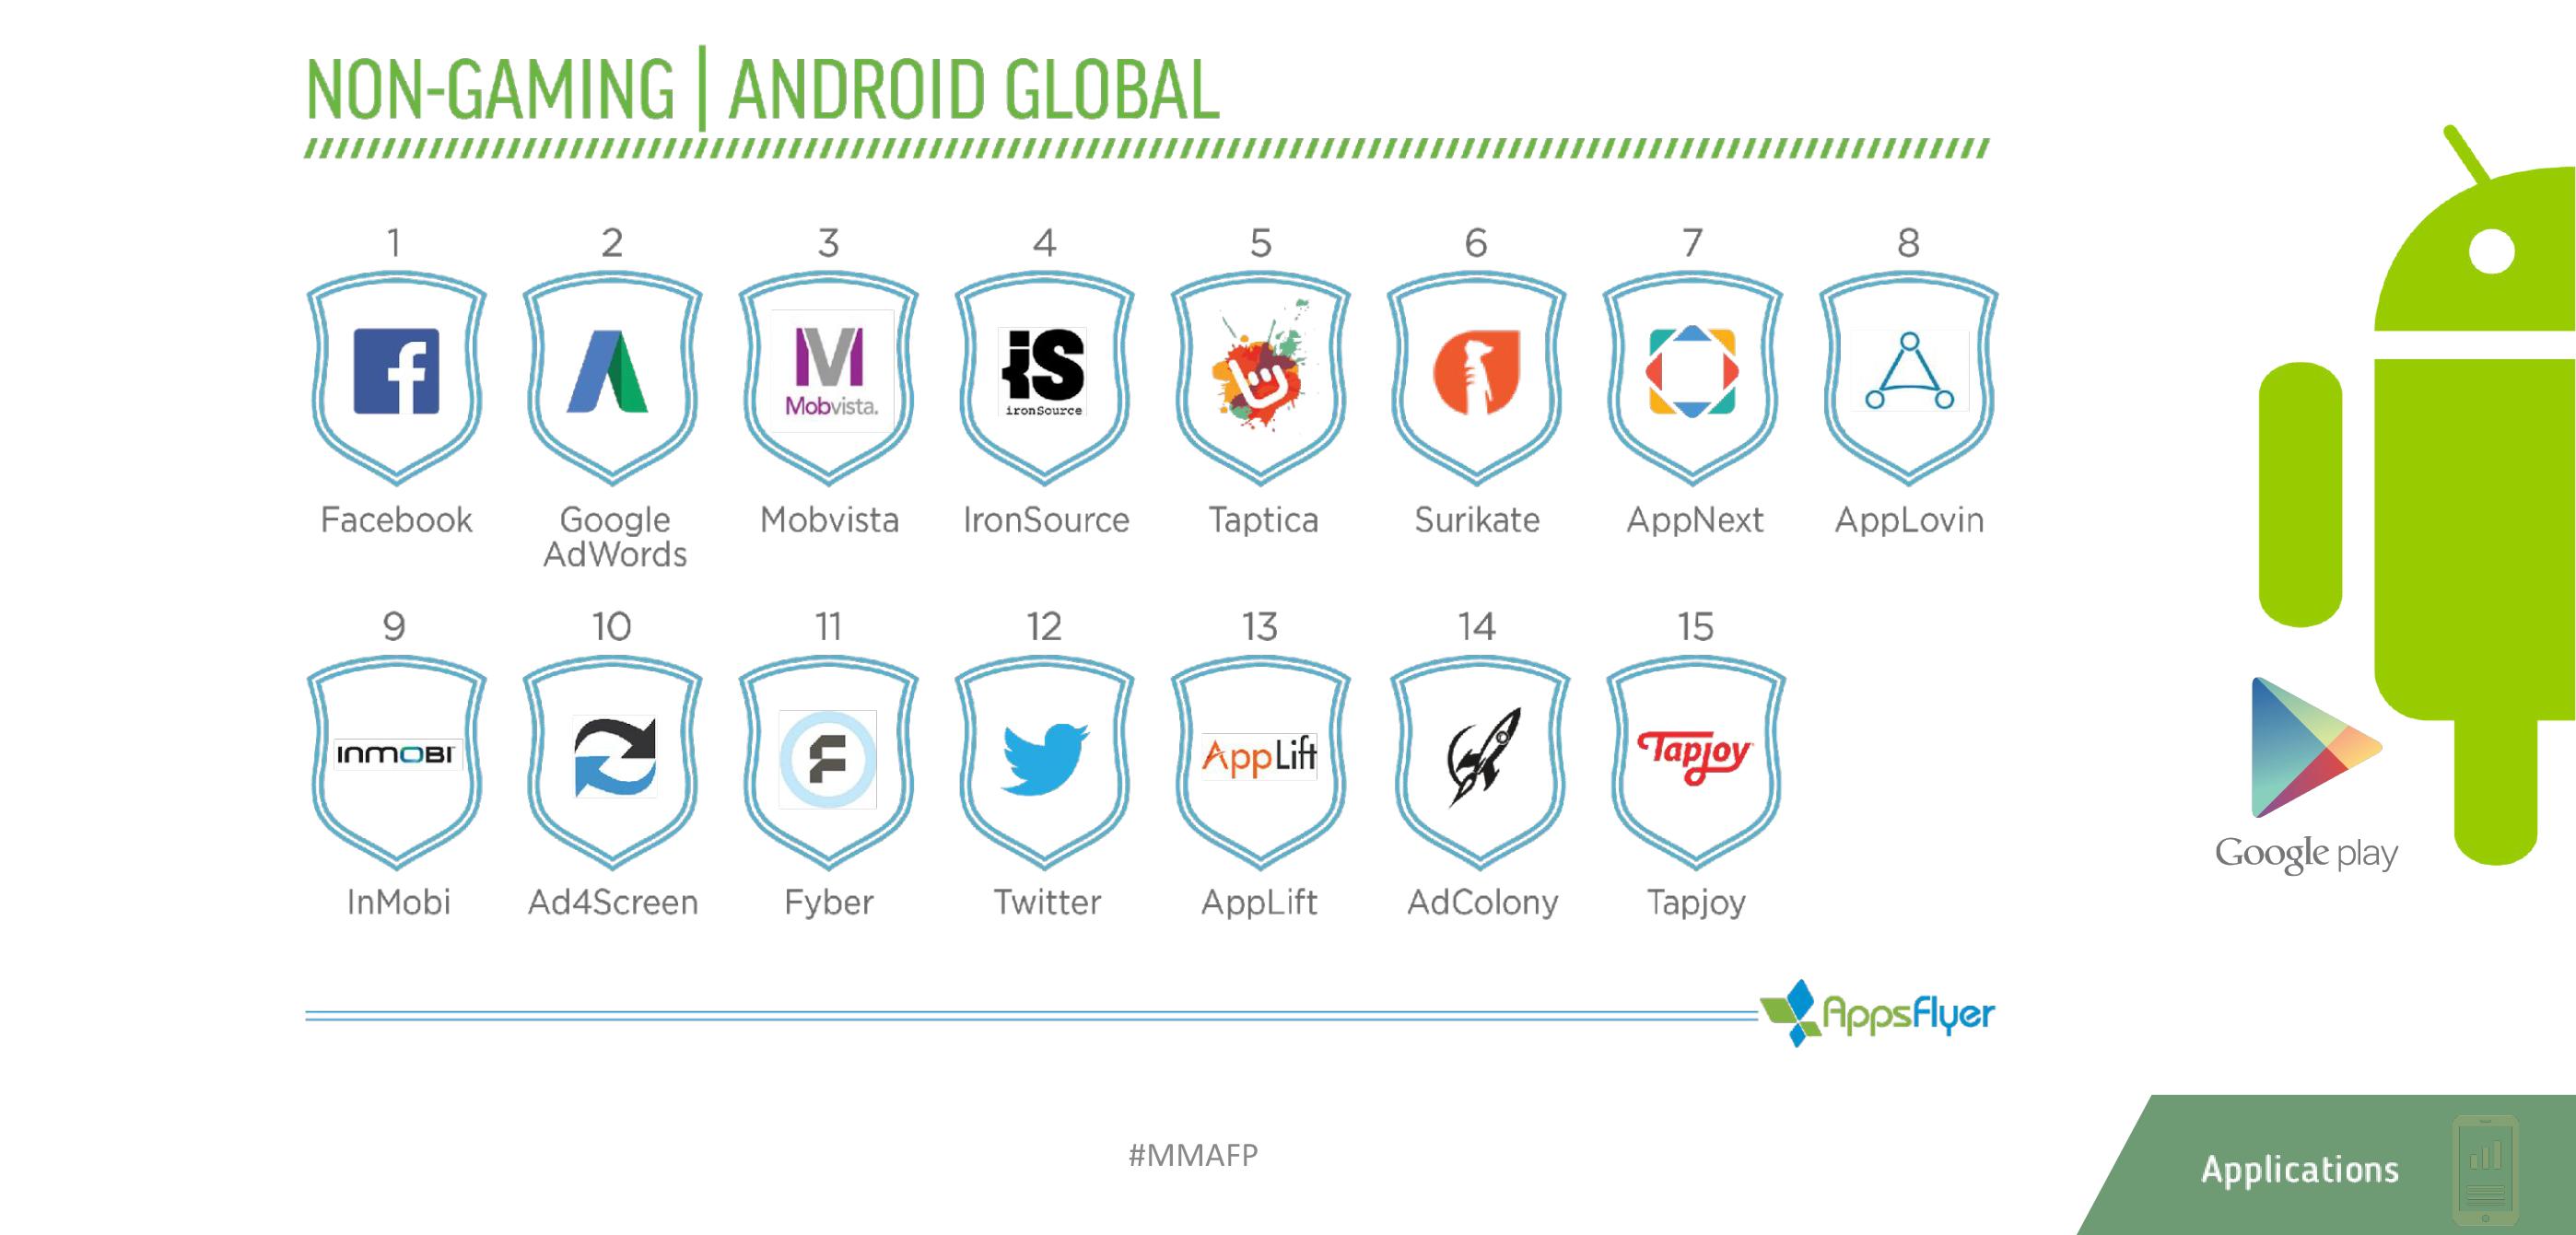 appsflyer mma ranking